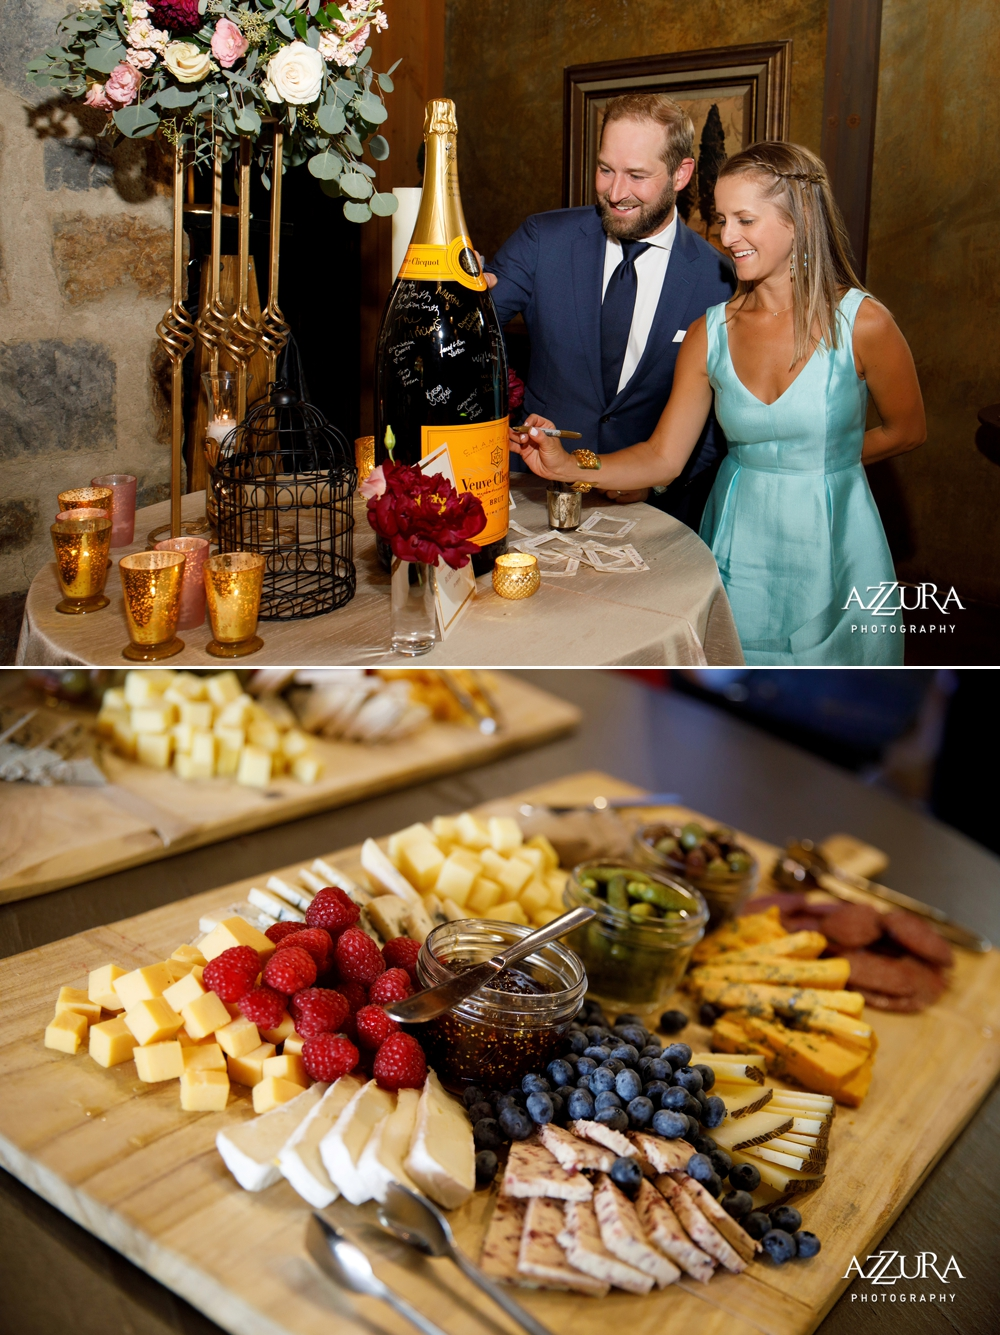 guest-enjoy-charcuterie-at-reception